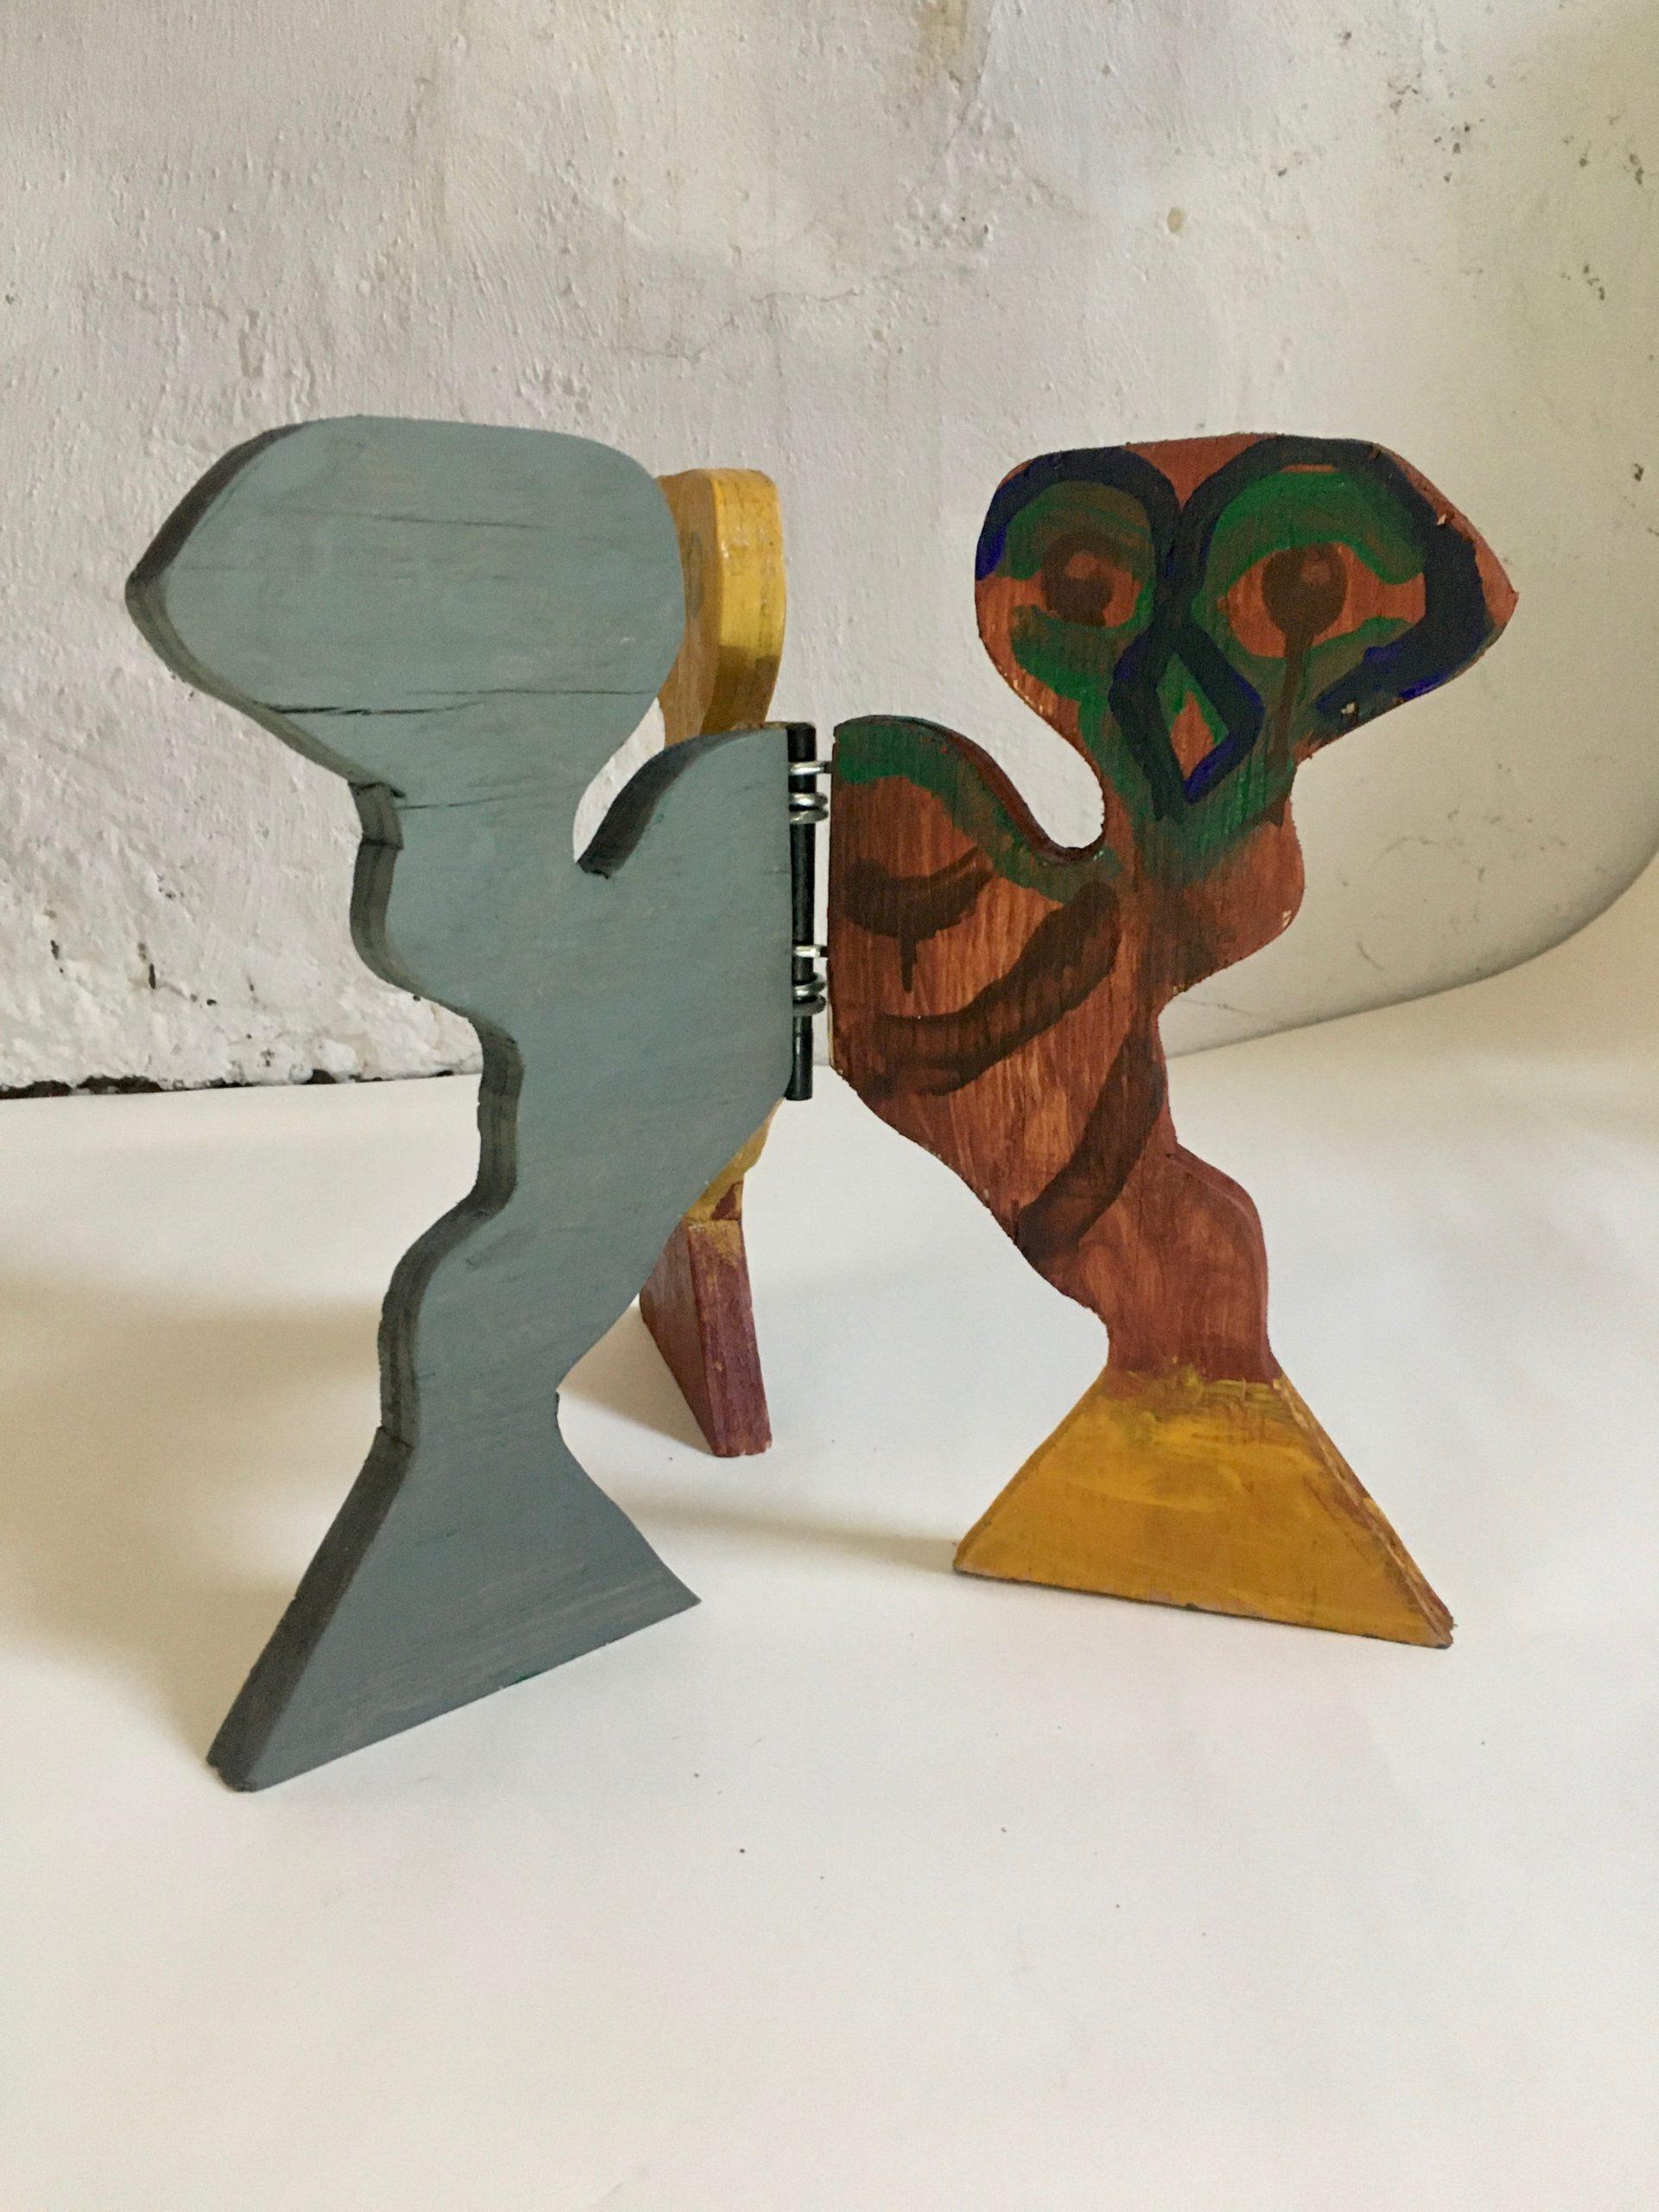 "Bill Saylor ""Triad,"" 2020. Wood, acrylic, metal, plastic, permanent wax pastel. Exhibited at Duck Creek in June 2020."